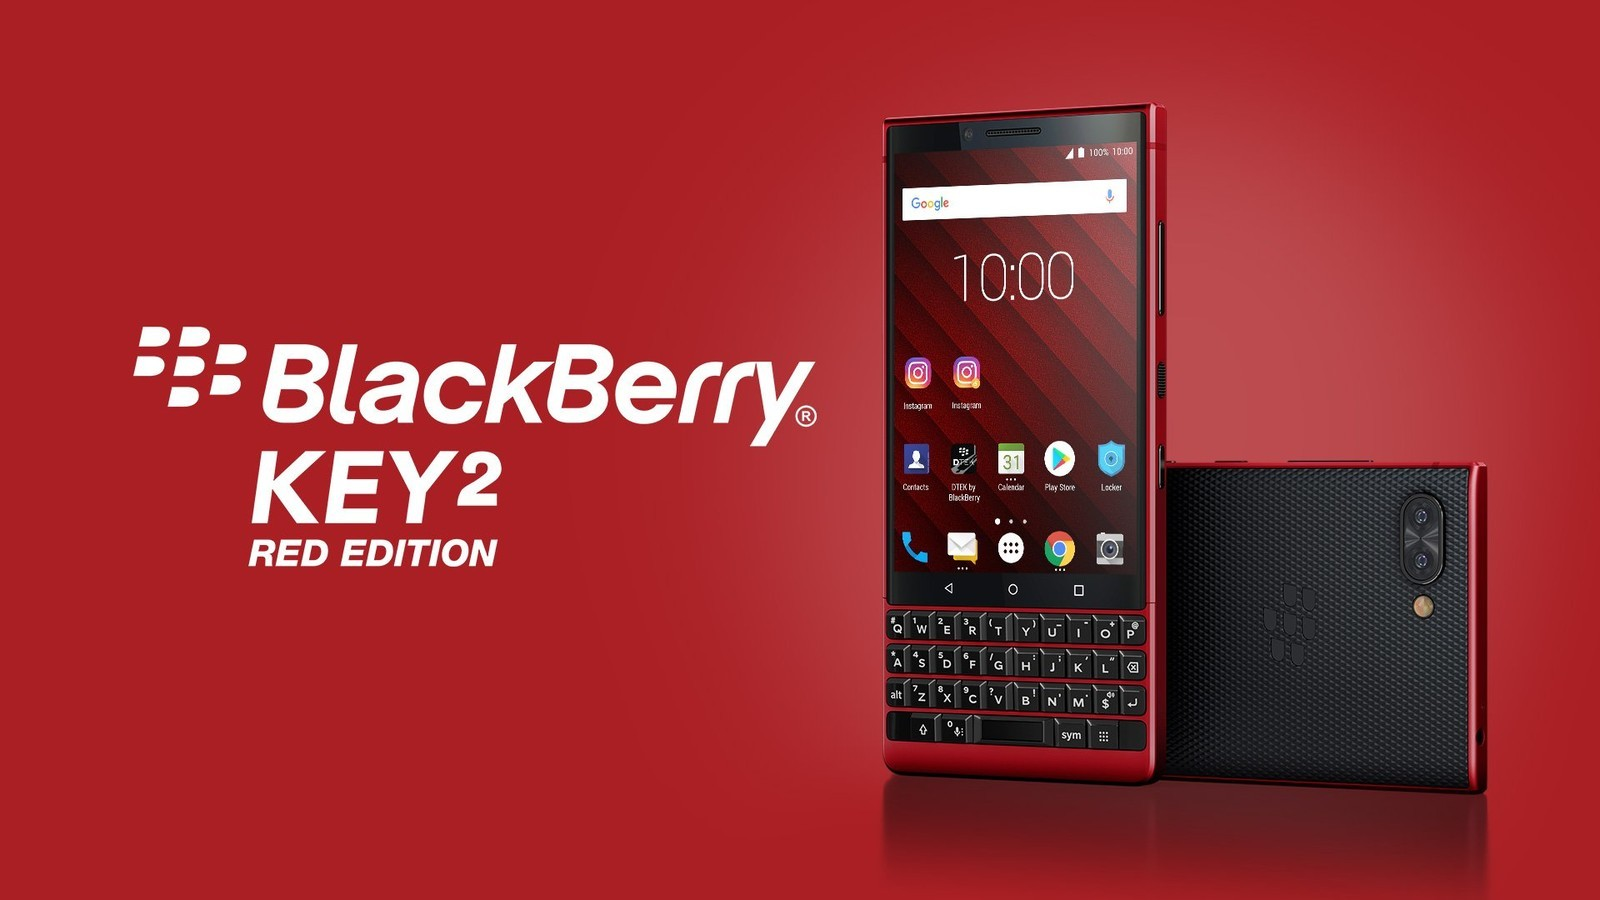 Компания TCL представила новый BLACKBERRY KEY2 RED EDITION